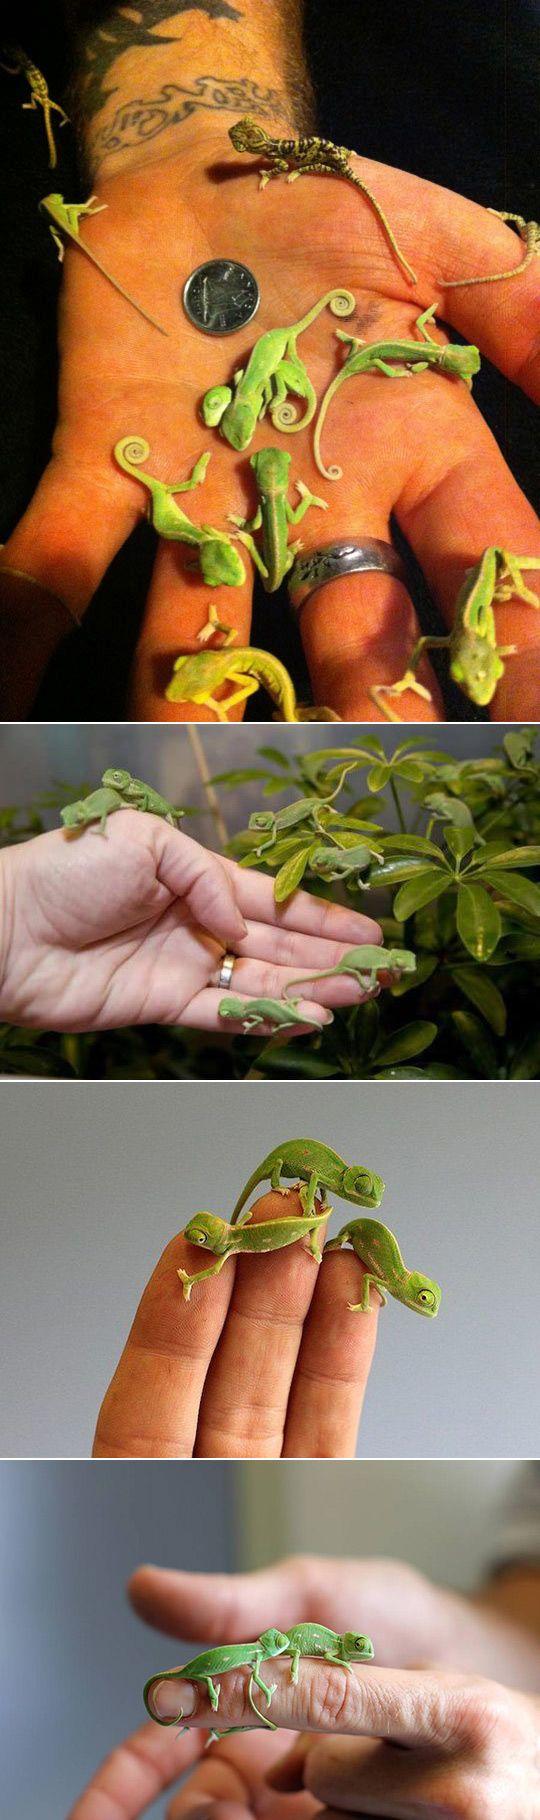 25 amazing chameleon pictures - Newborn Chameleons